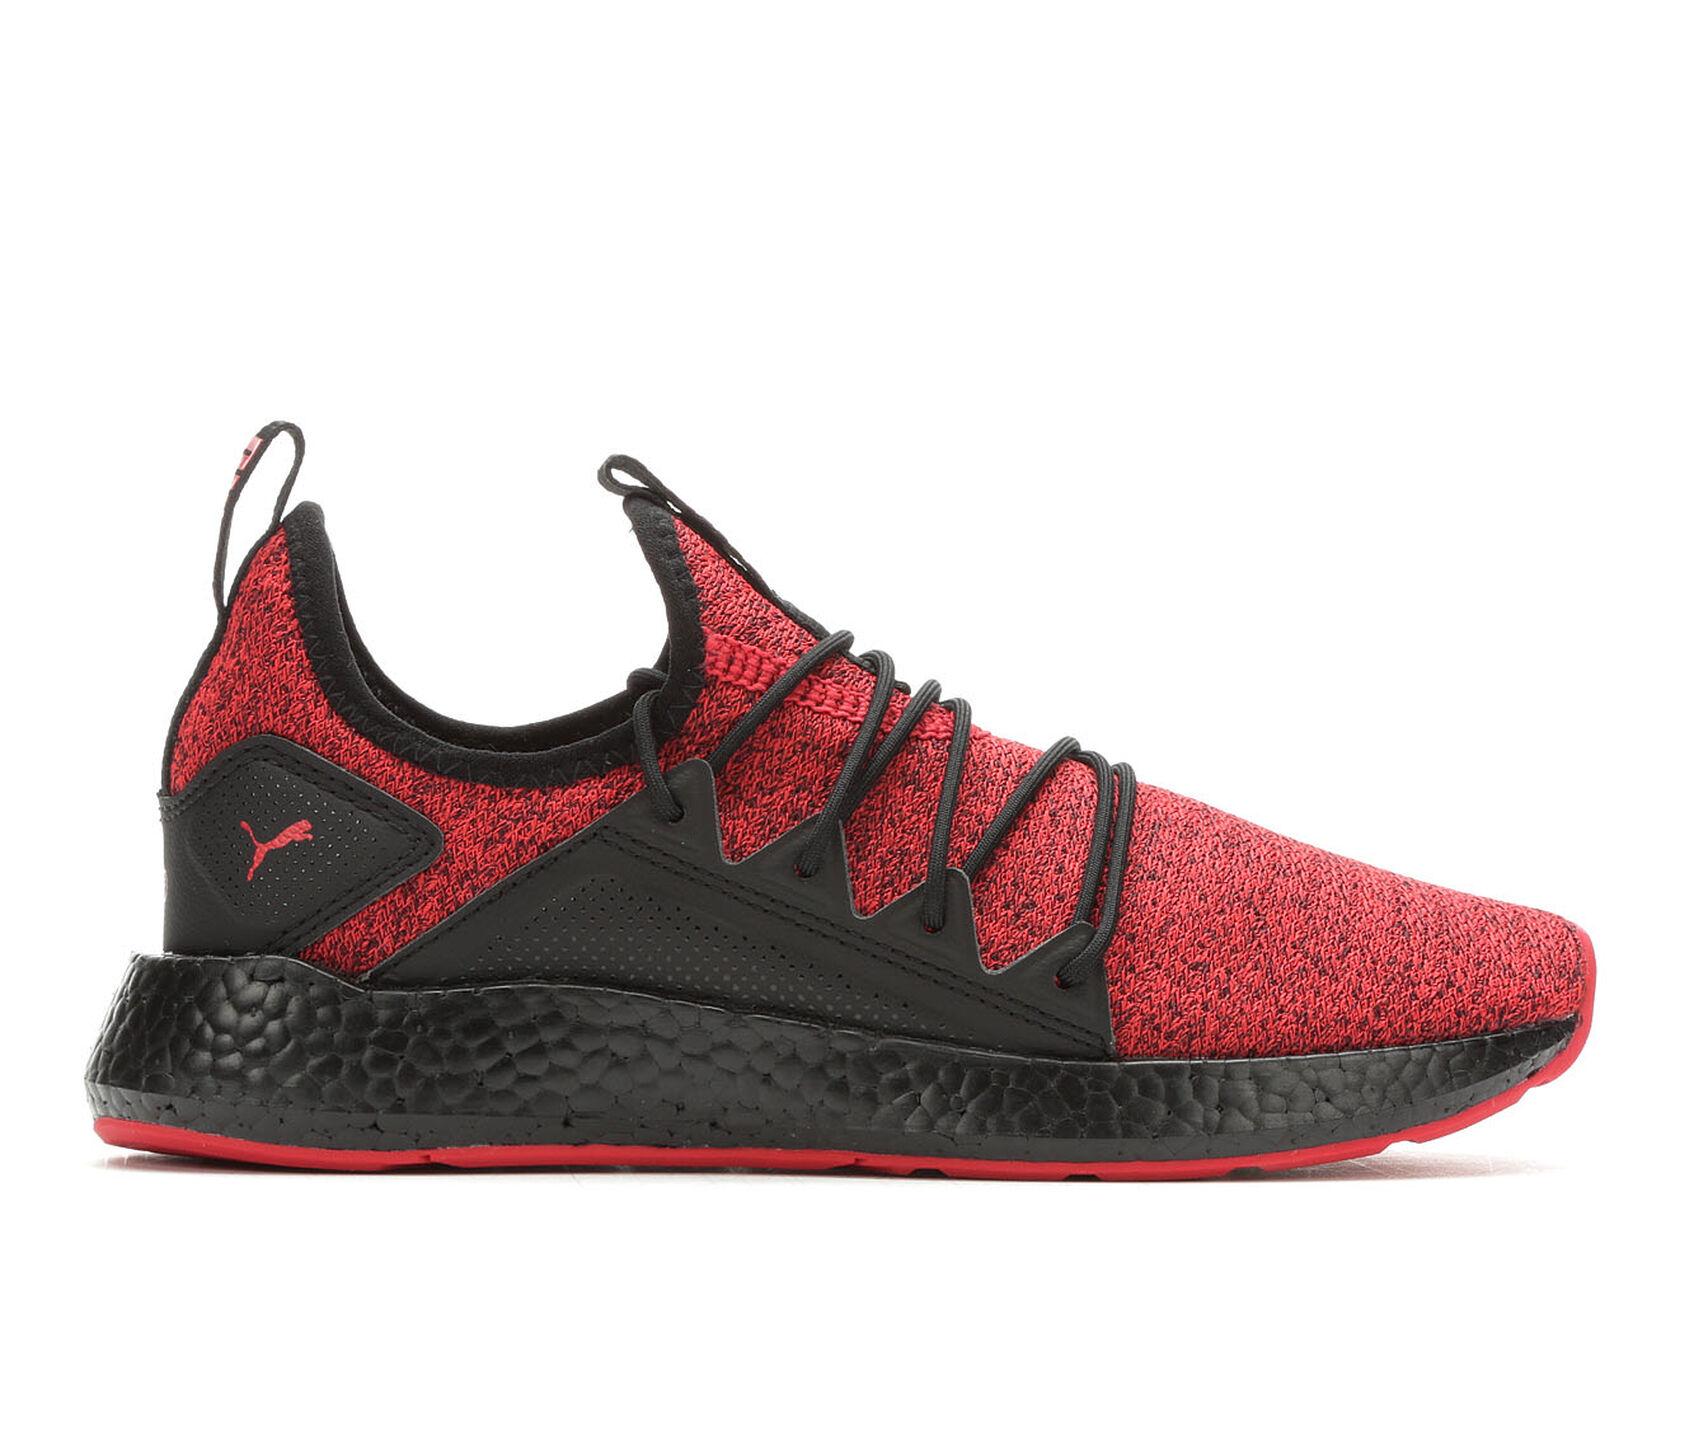 8a4709be9e19 ... Puma Big Kid Neko Knit Jr Running Shoes. Previous